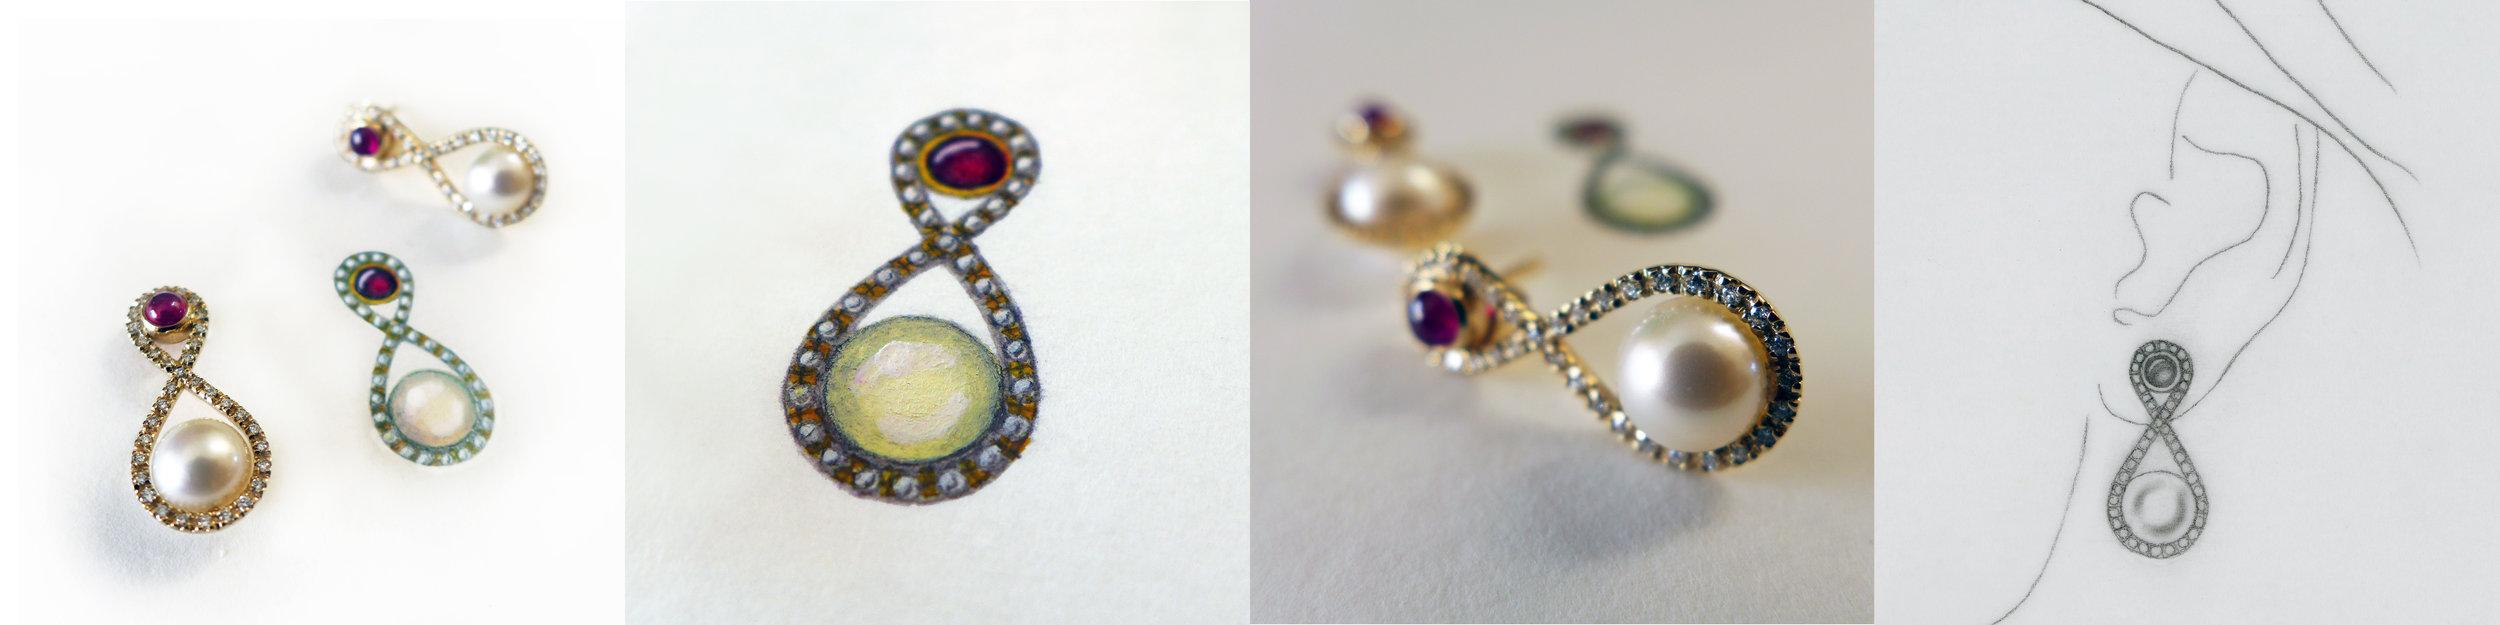 custom pearls 3.jpg